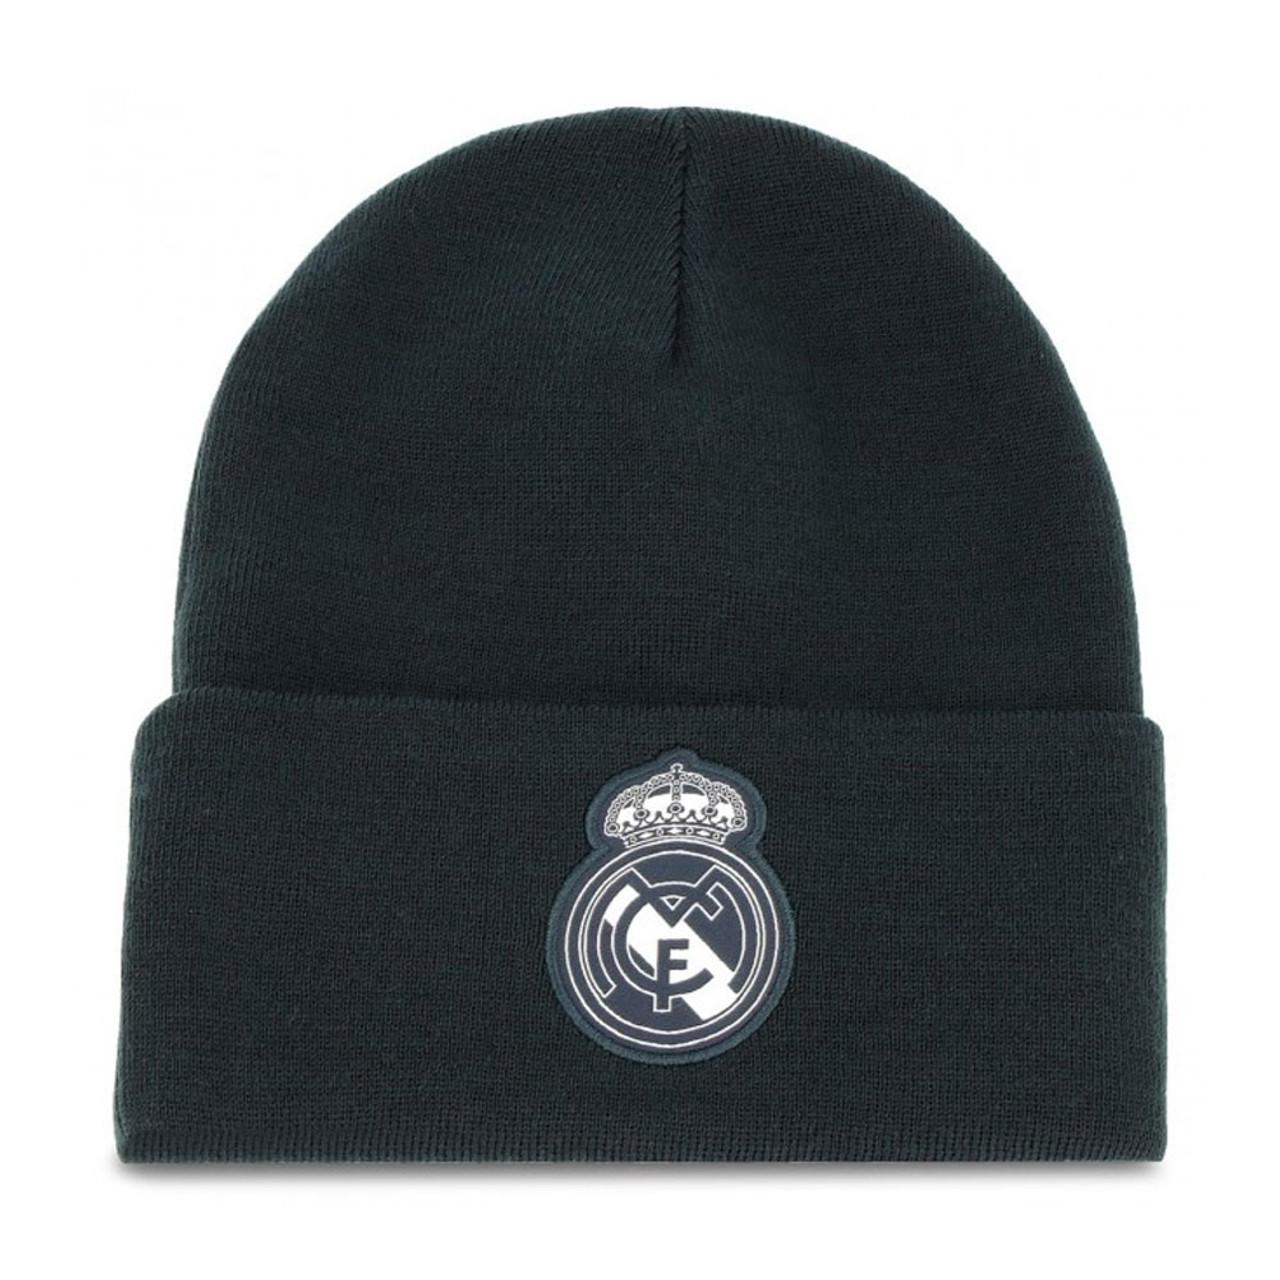 3e3545a52b4 ADIDAS Real Madrid football beanie hat  black